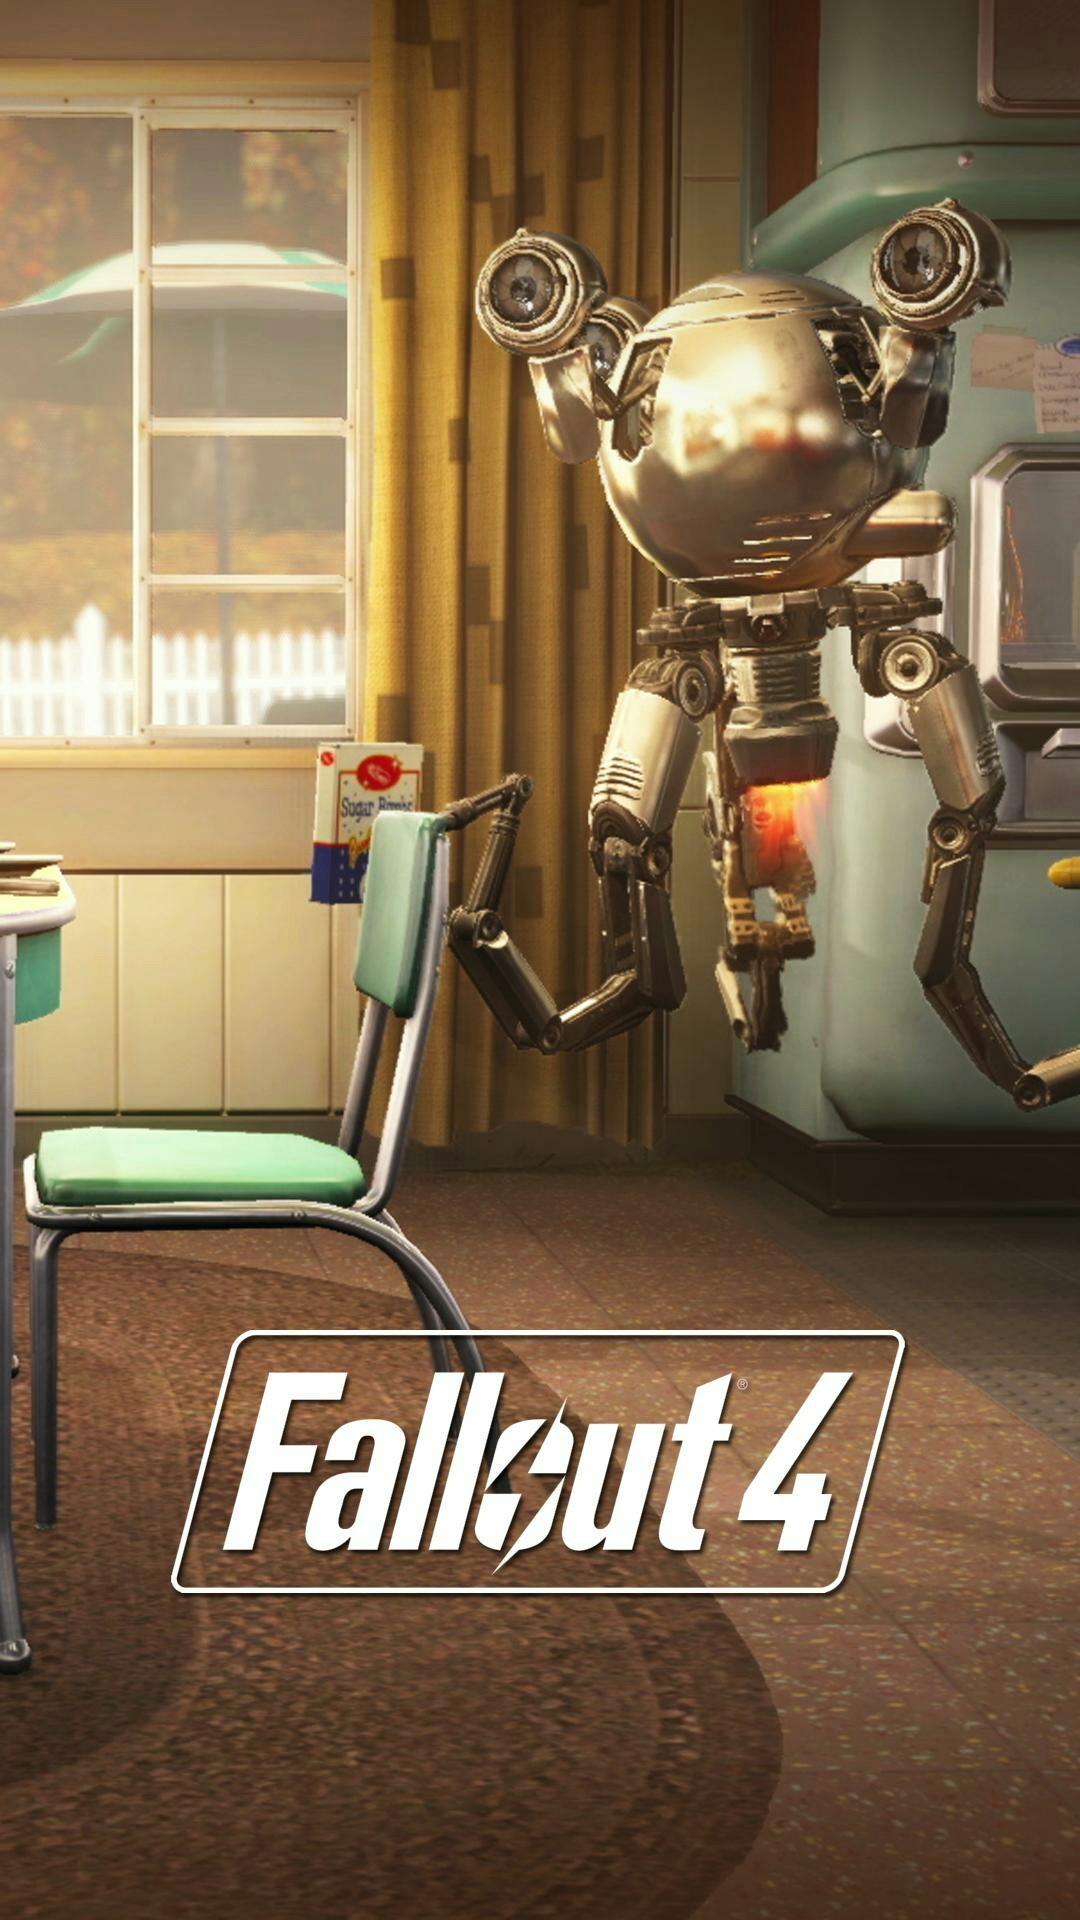 Fallout 4 Mr gutsy robot mobile phone wallpaper